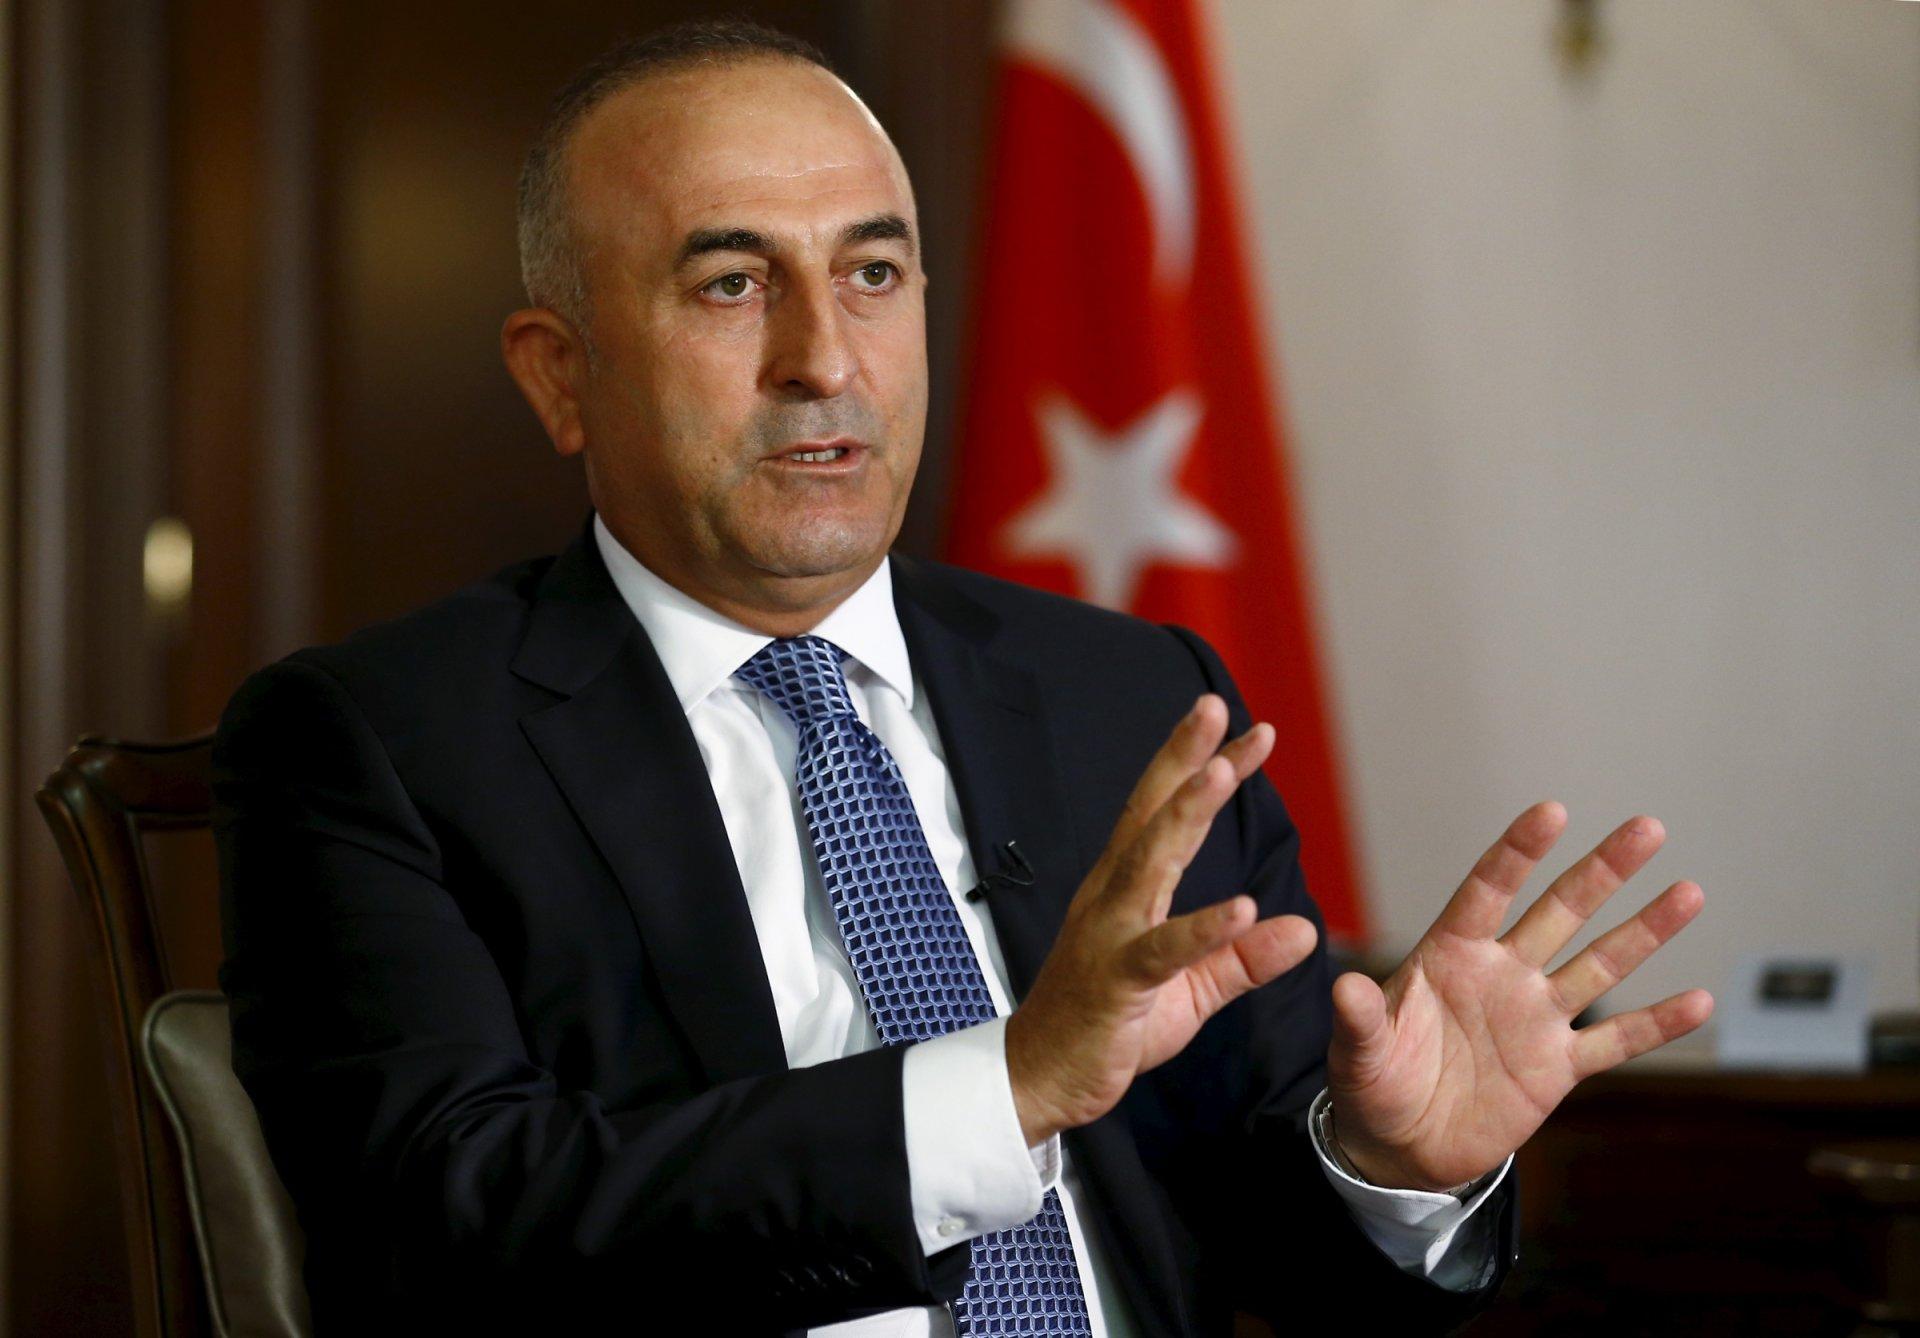 Cavusoglu: «Μέχρι τον Μάιο δεν μπορούμε να ξεκινήσουμε διαπραγματεύσεις για το Κυπριακό»